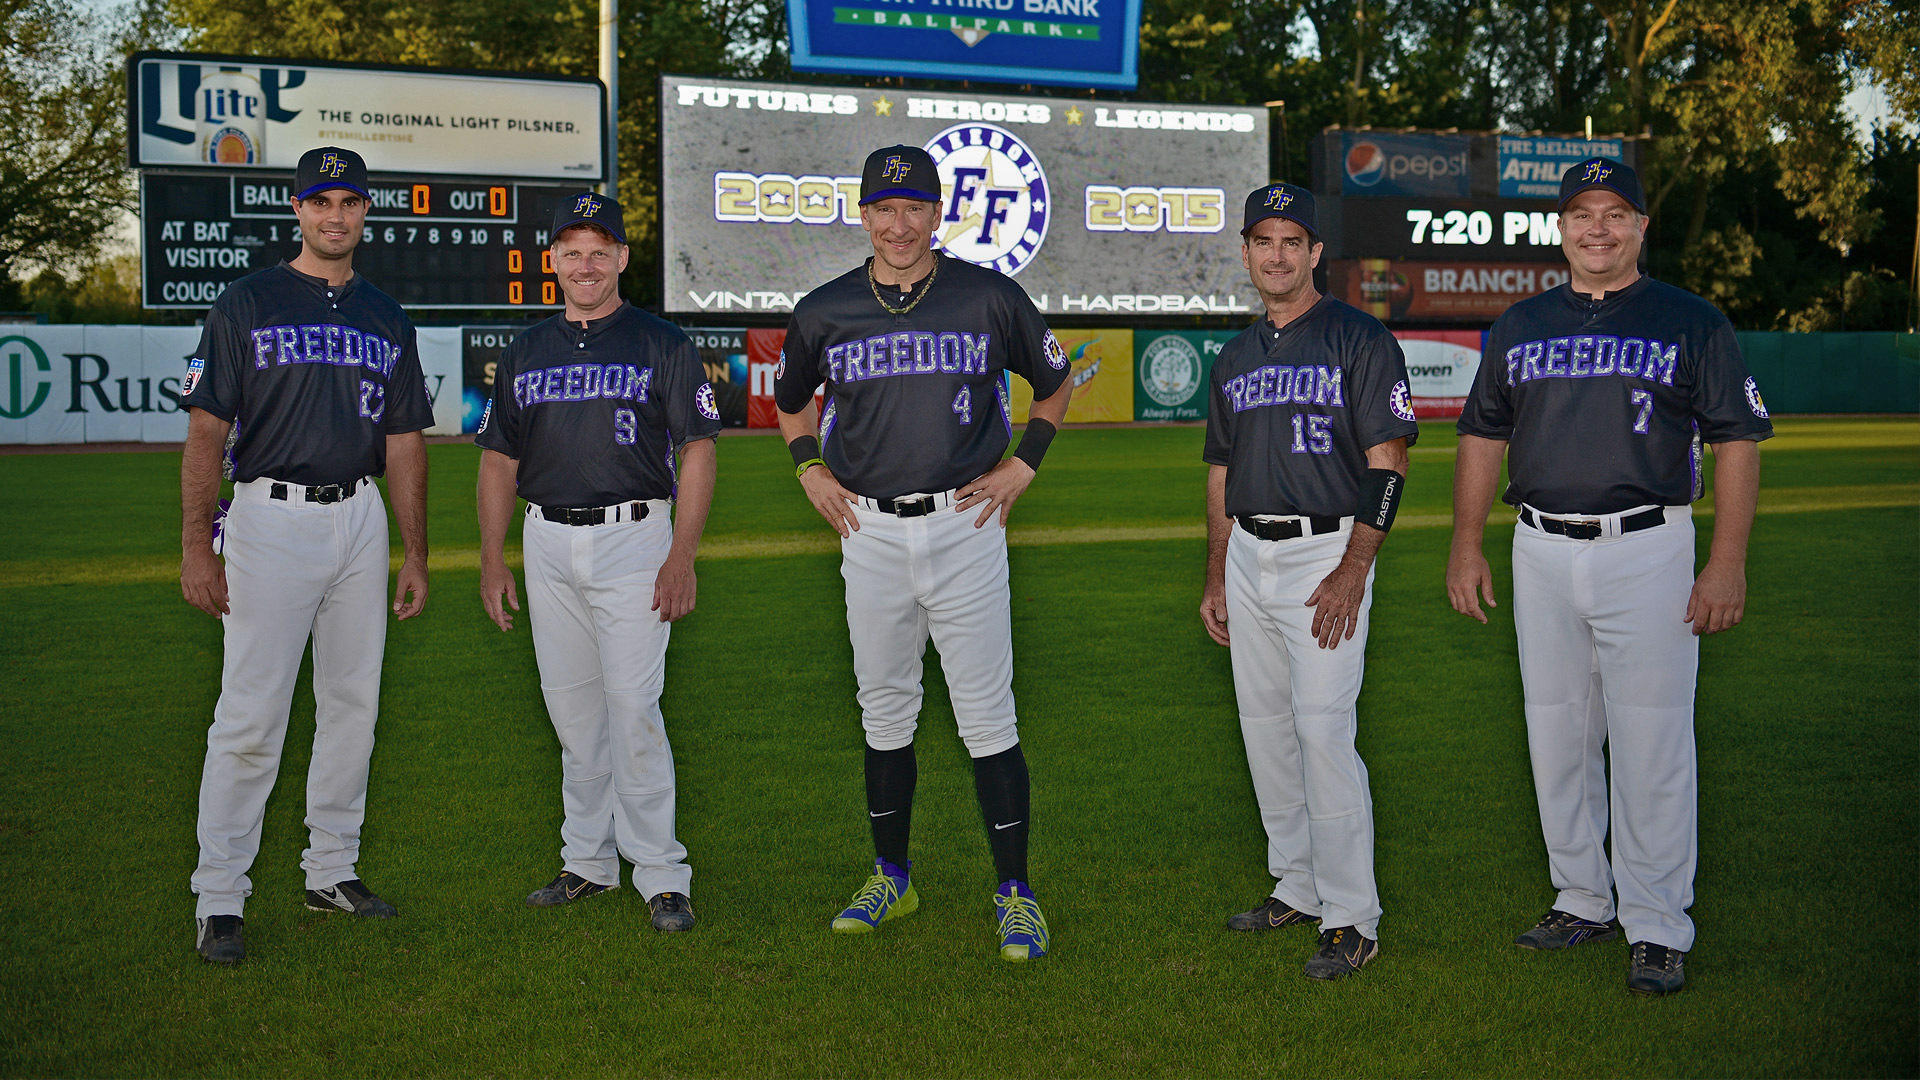 Markiewicz Team Freedom Fighters Baseball